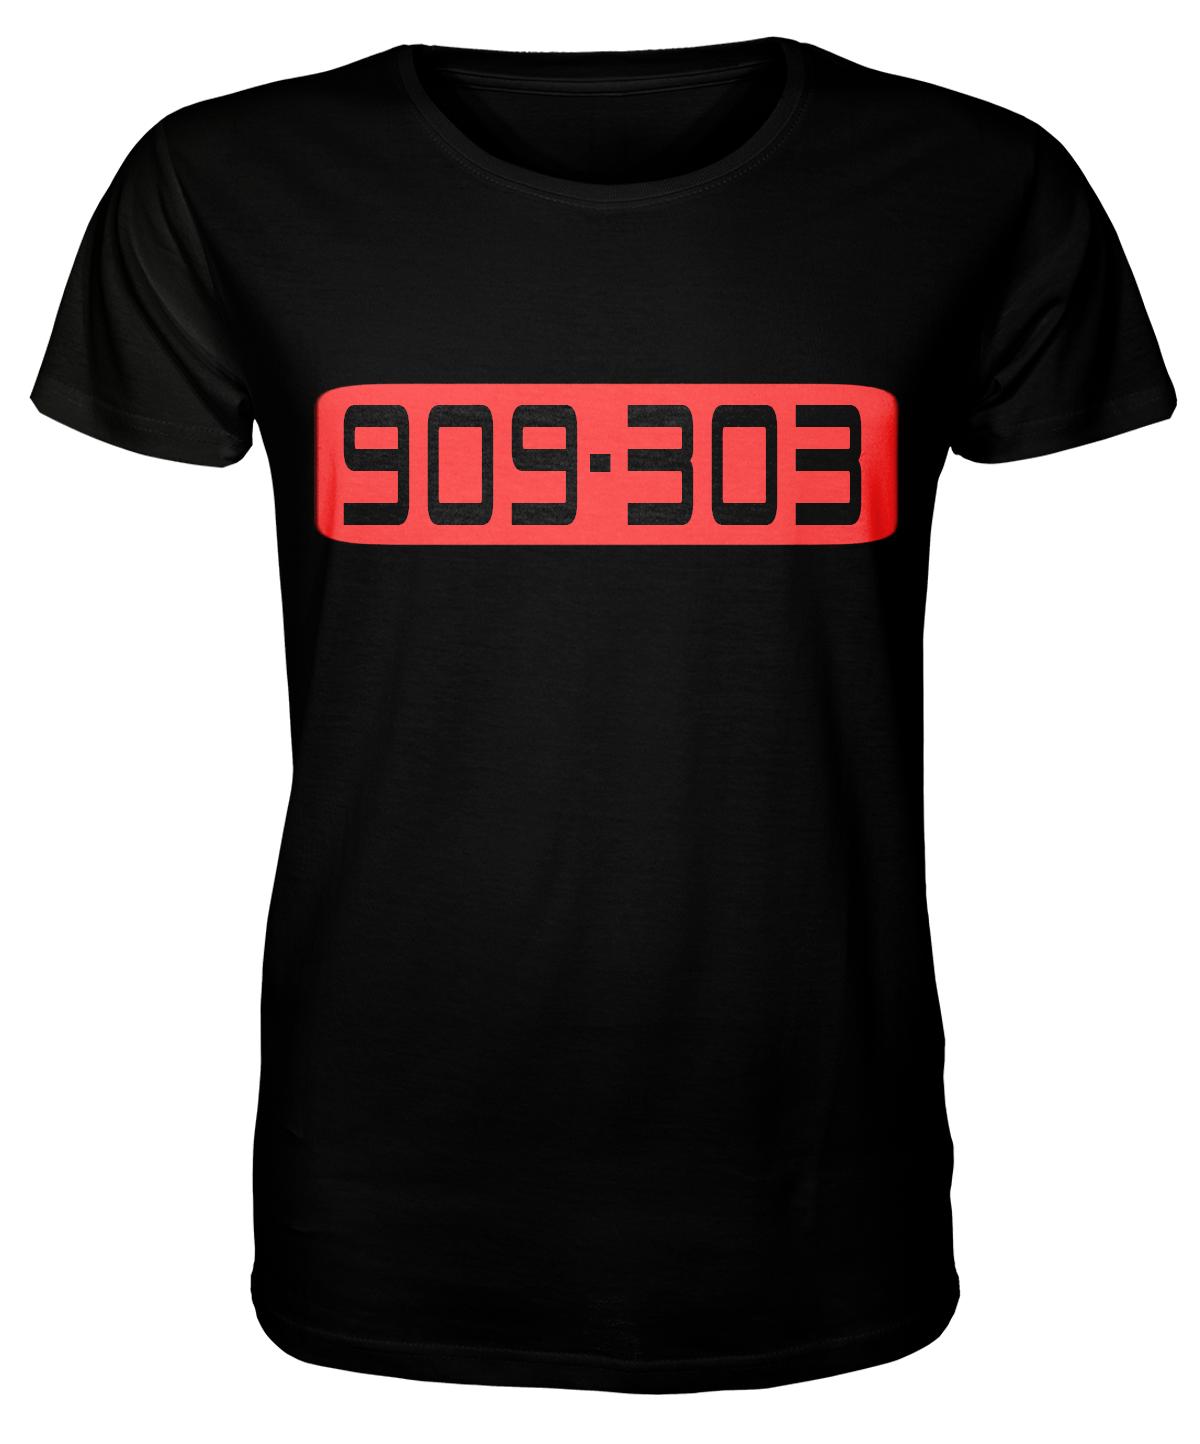 2018 Summer T Shirt 909, 303 Roland, Dance Music, Hiphop, Techno, EDM, Electronic Drum Machine O Neck Shirt Plus Size T-shirt